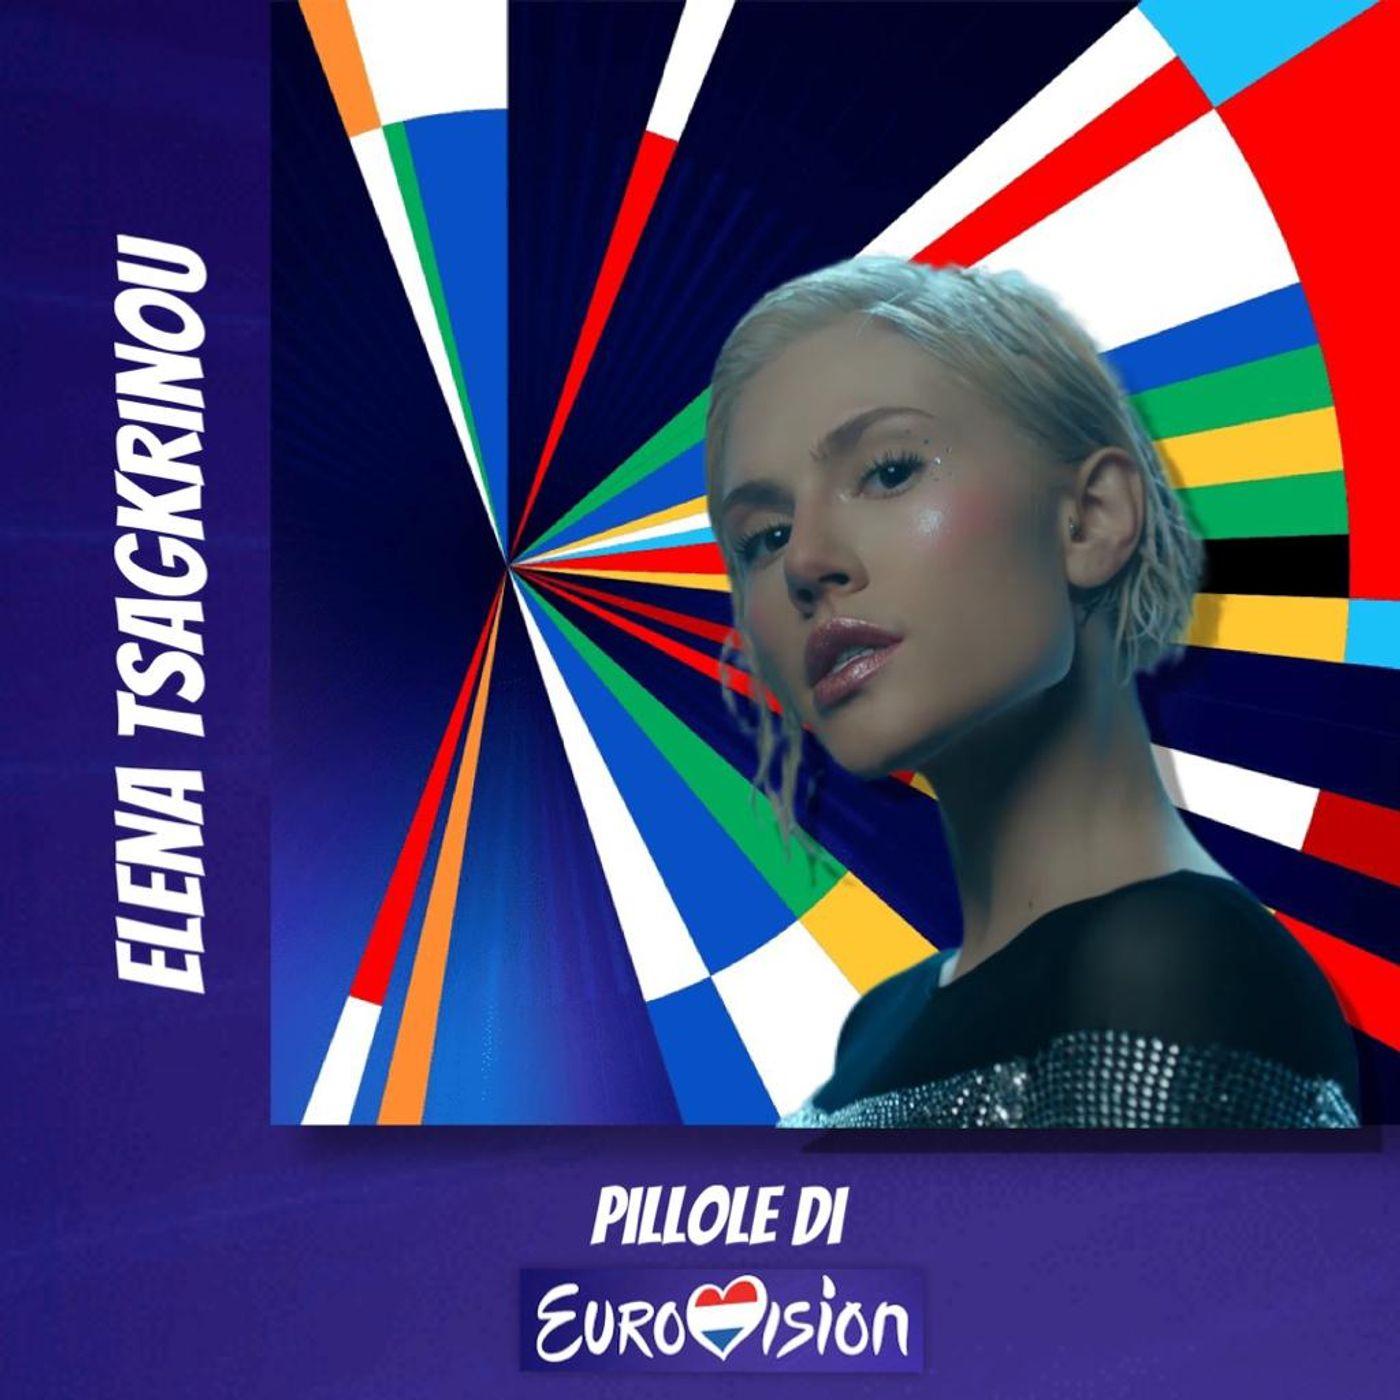 Pillole di Eurovision: Ep. 8 Elena Tsagkrinou